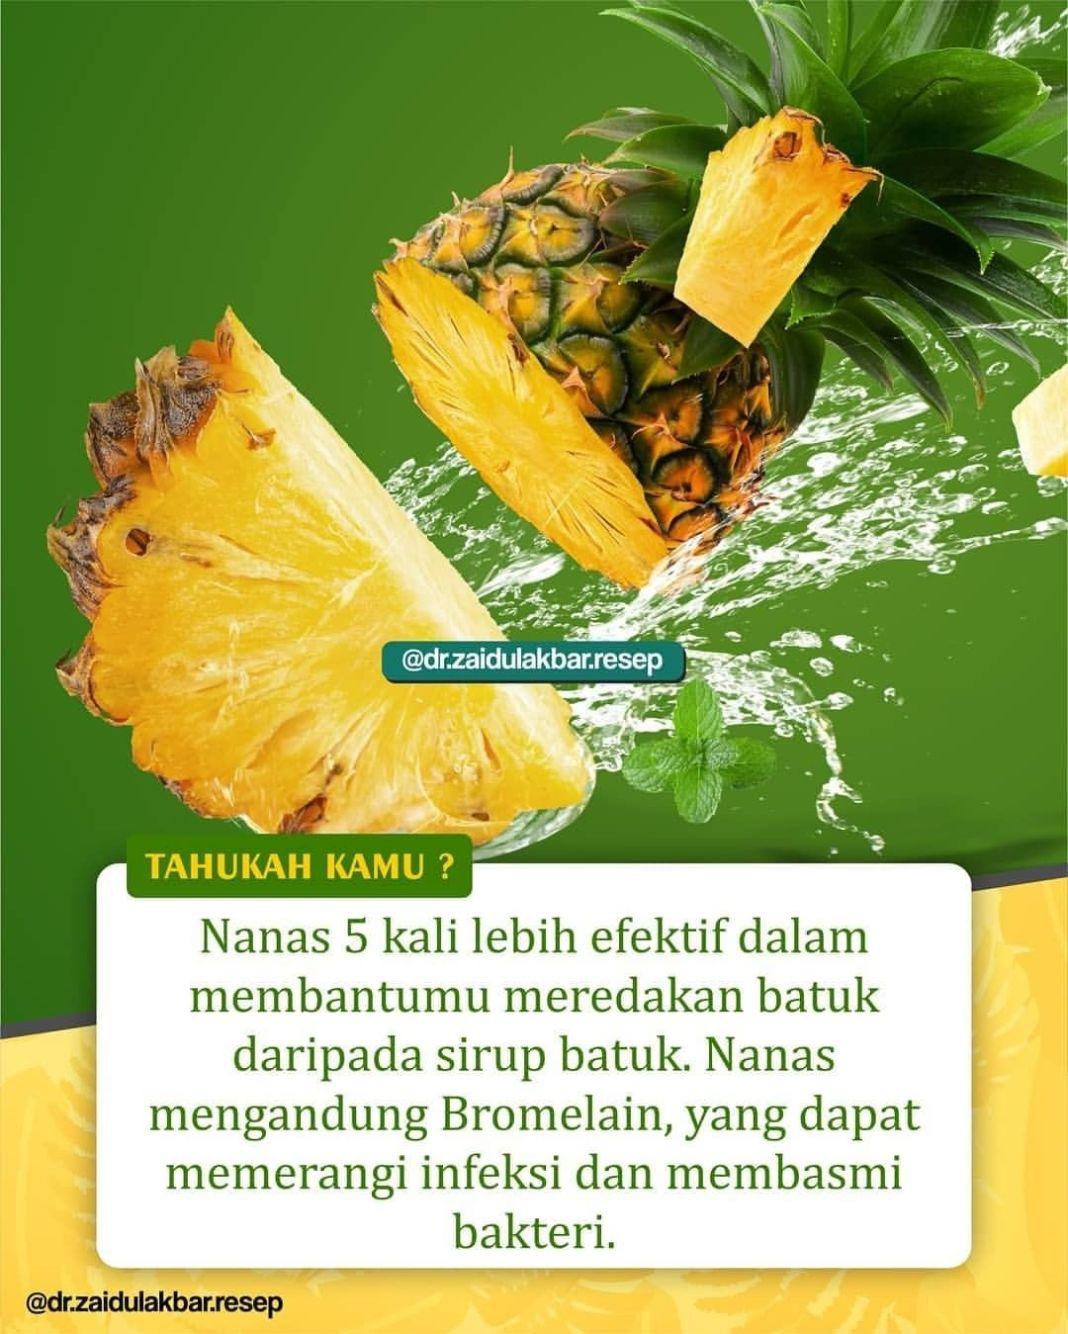 Info sehat, Membuat jus nanas sendiri jauh lebih baik daripada jus kemasan yang dijual di toko atau swalaya…